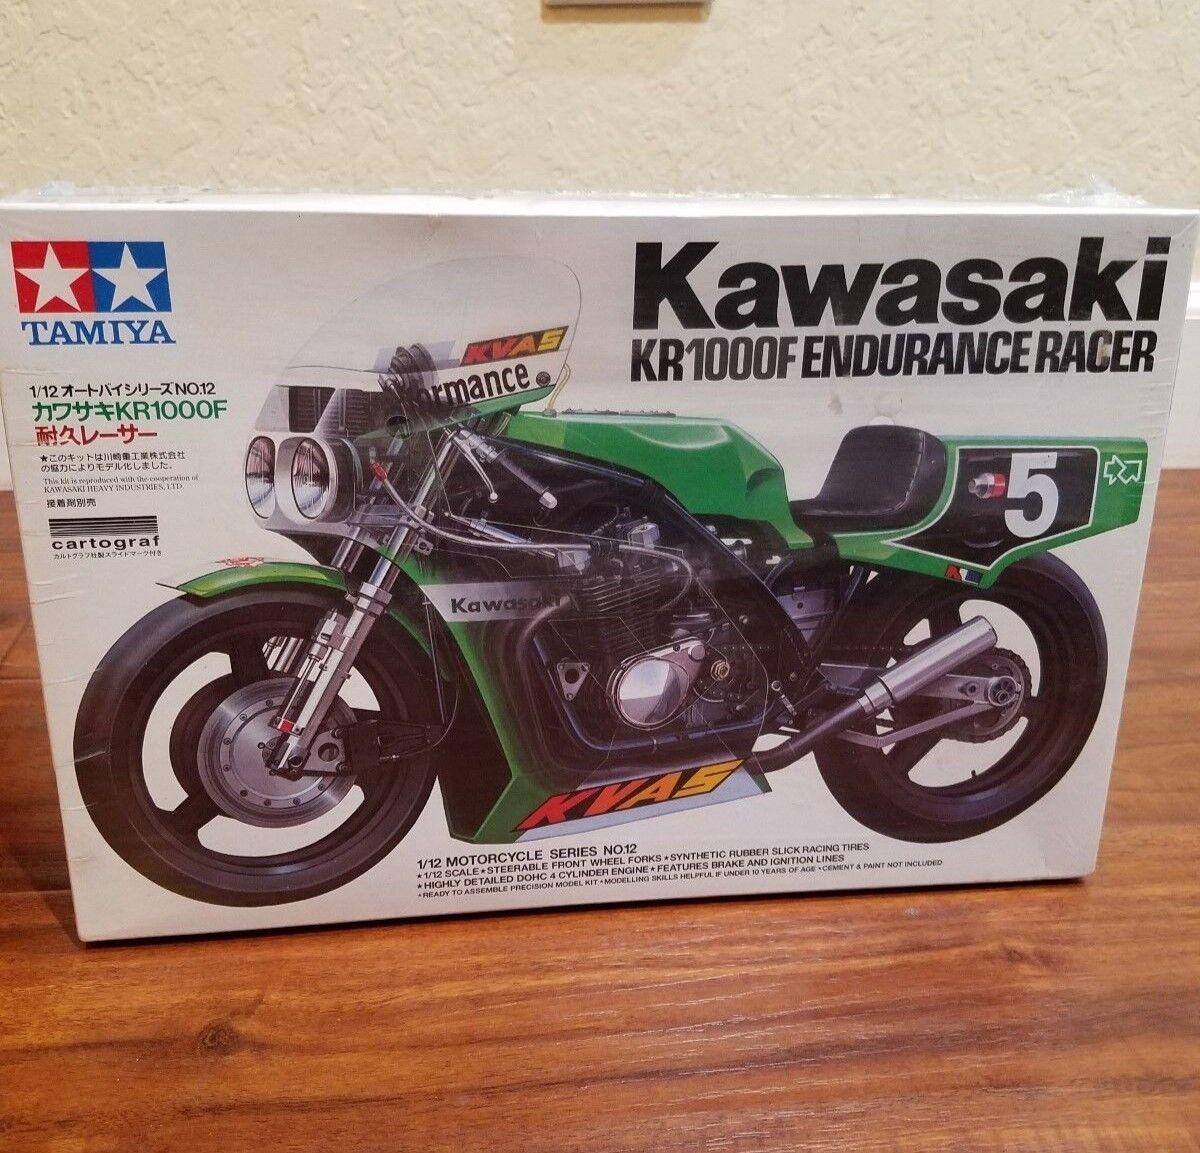 KAWASAKI KR1000F resistencia Racer Tamiya 1 12 Motocicleta Nuevo